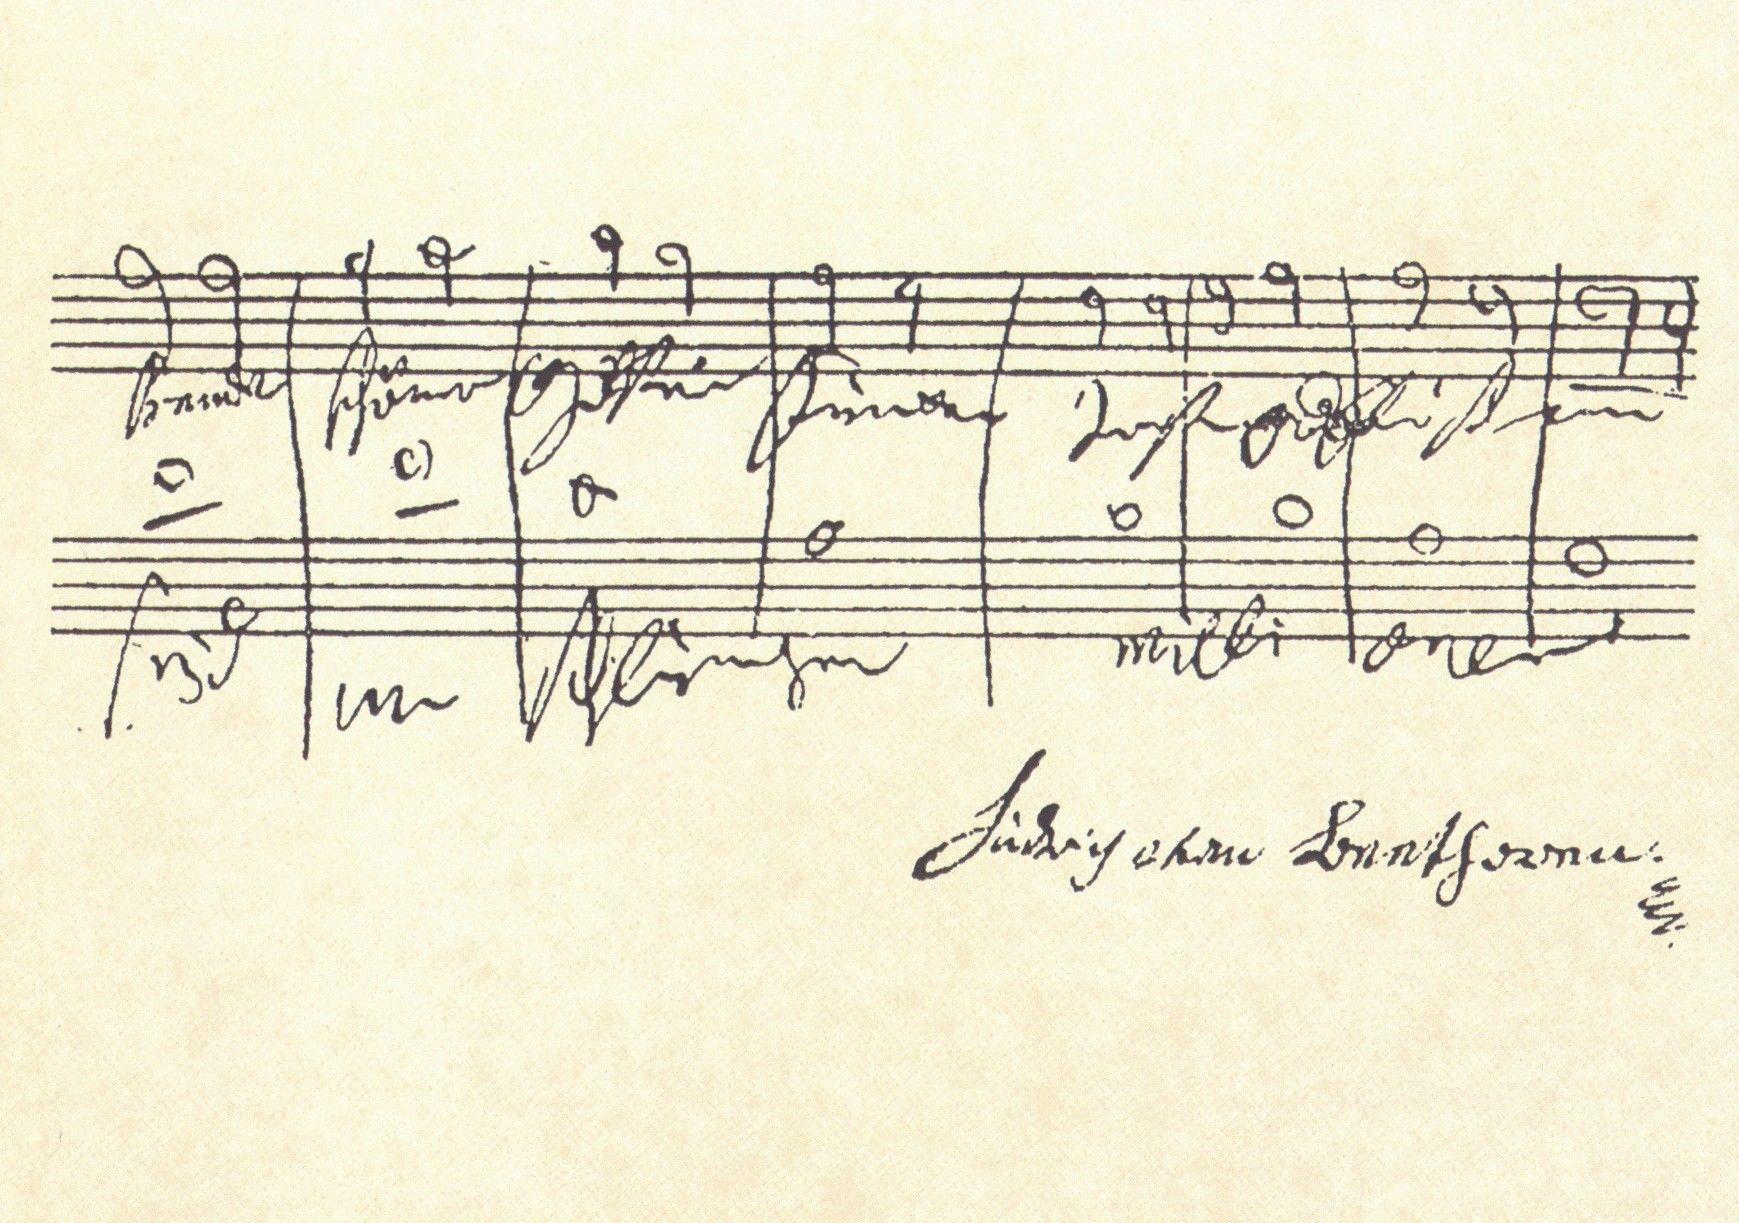 "LUDWIG VAN BEETHOVEN Neunte Symphonie , d-moll,op.125 Freude schötterfunken..."""